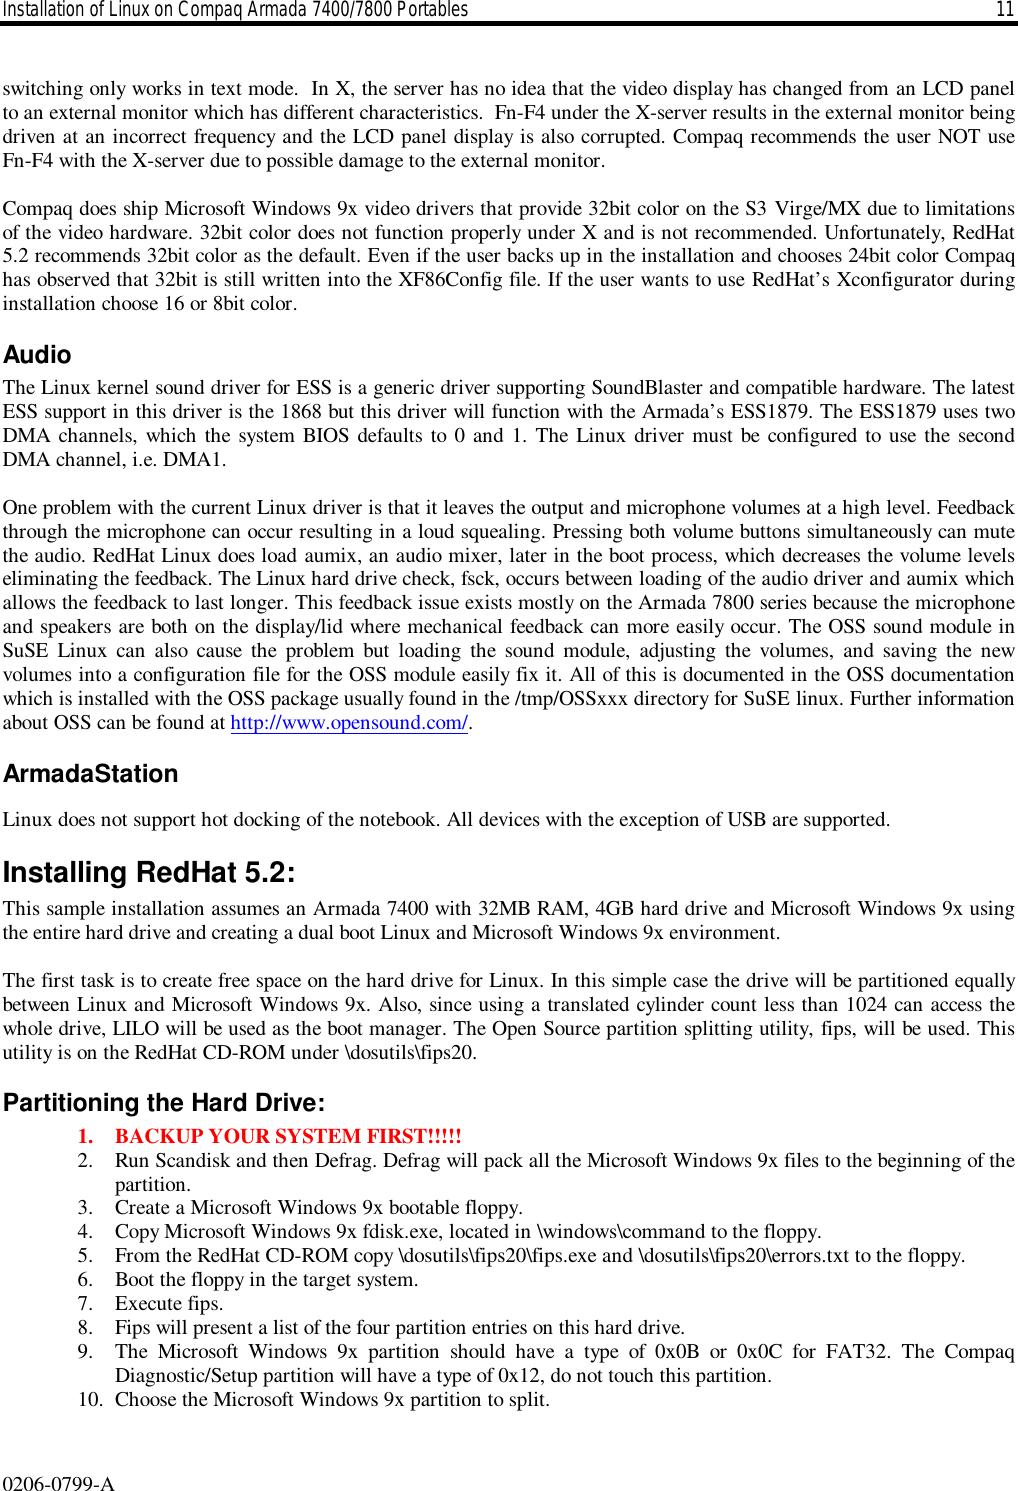 HP 0206 0799 A Installation Of Linux On Compaq Armada 7400